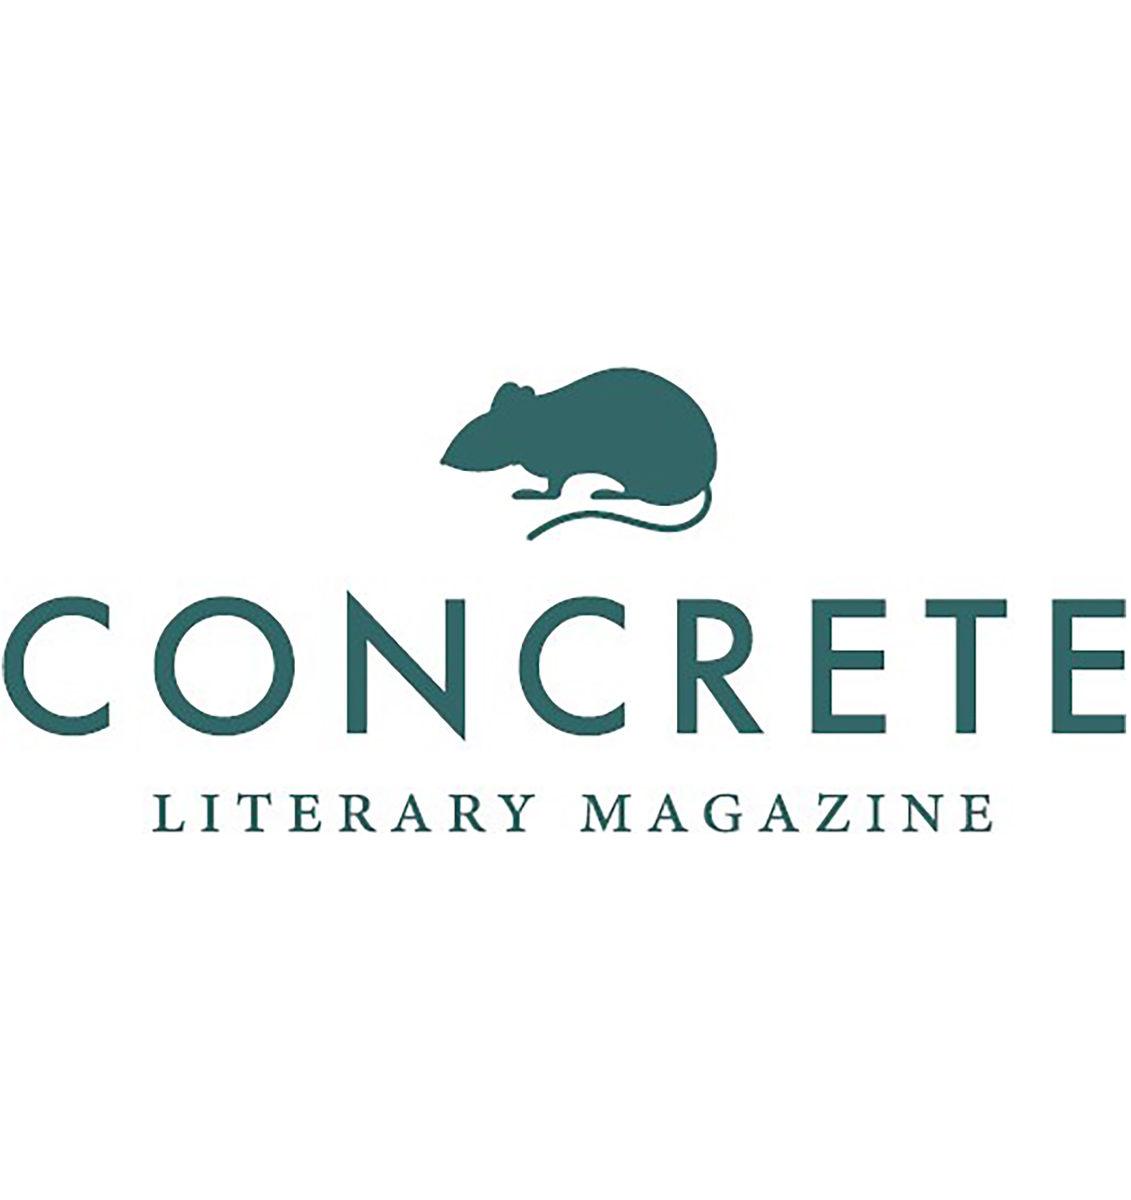 Concrete Literary Magazine logo